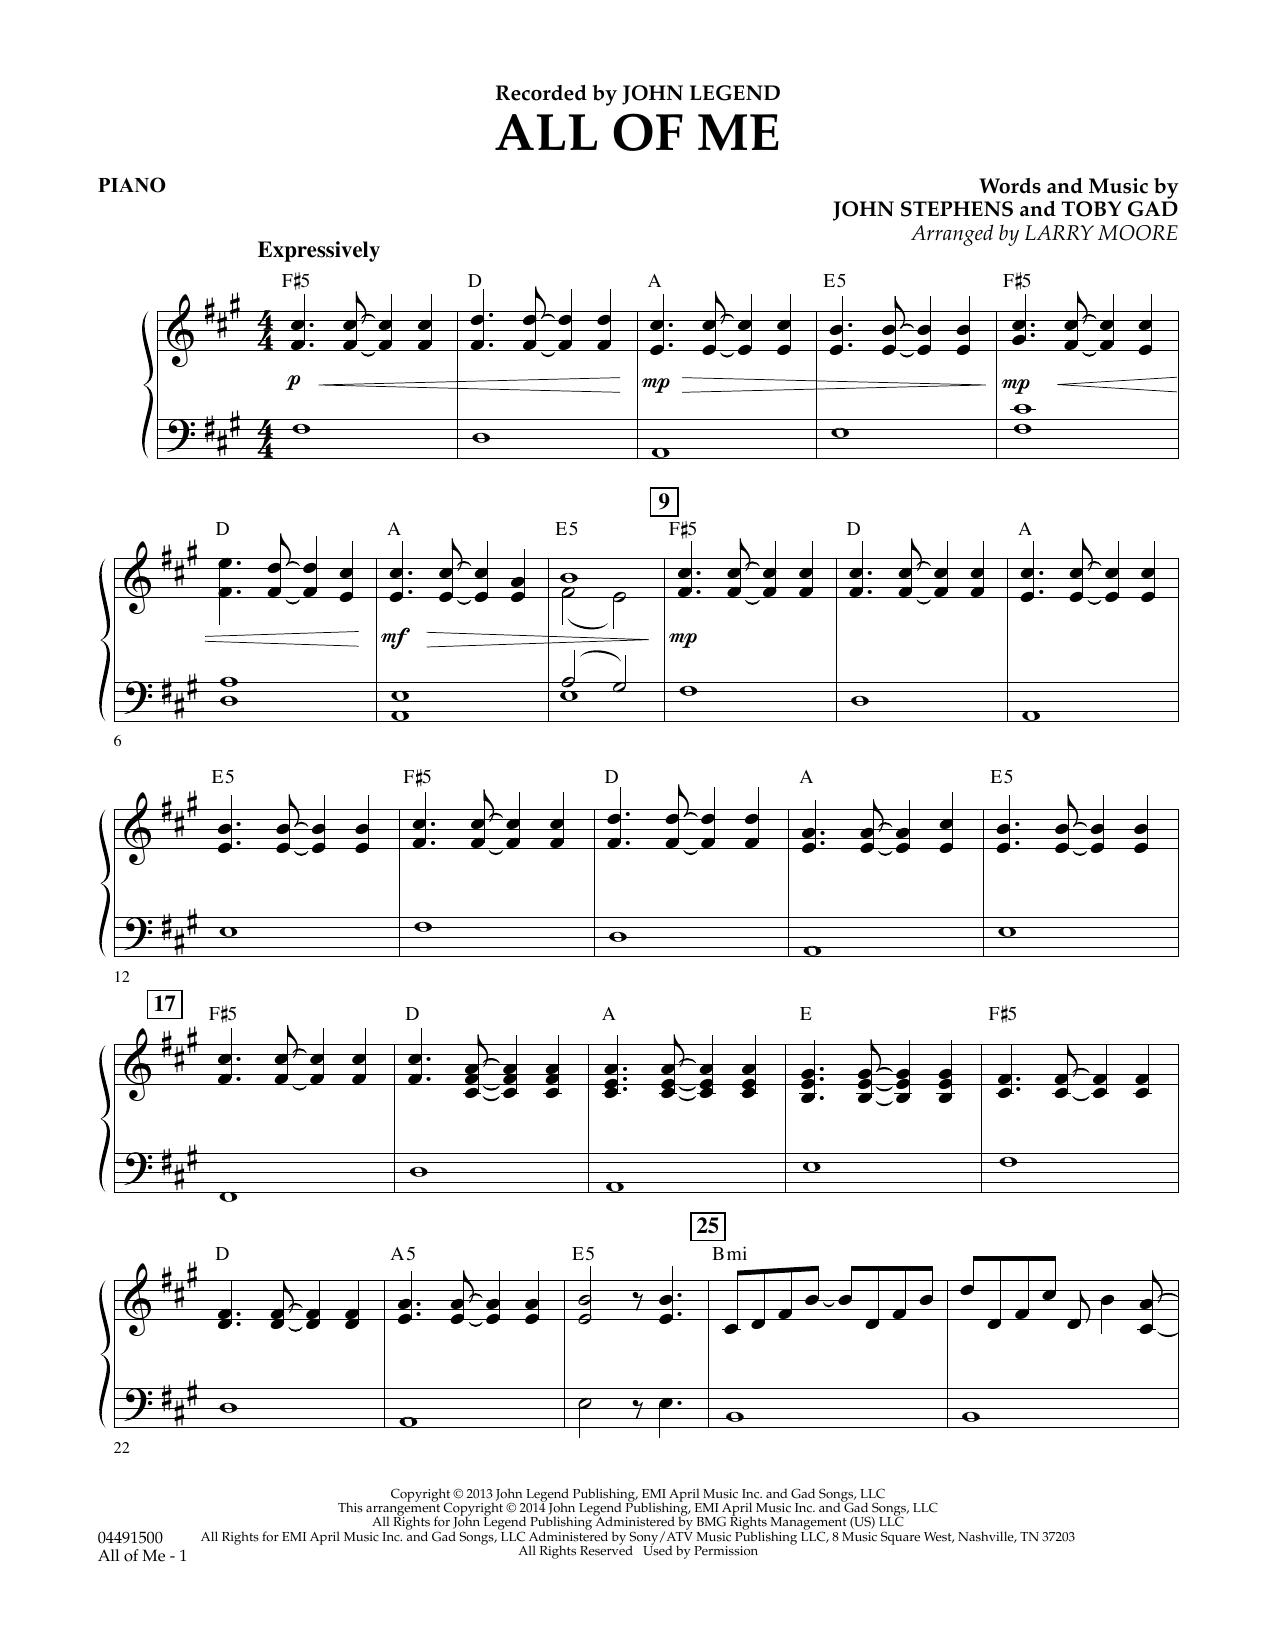 All Of Me Piano Sheet Music sheet music digital files to print - licensed john stephens